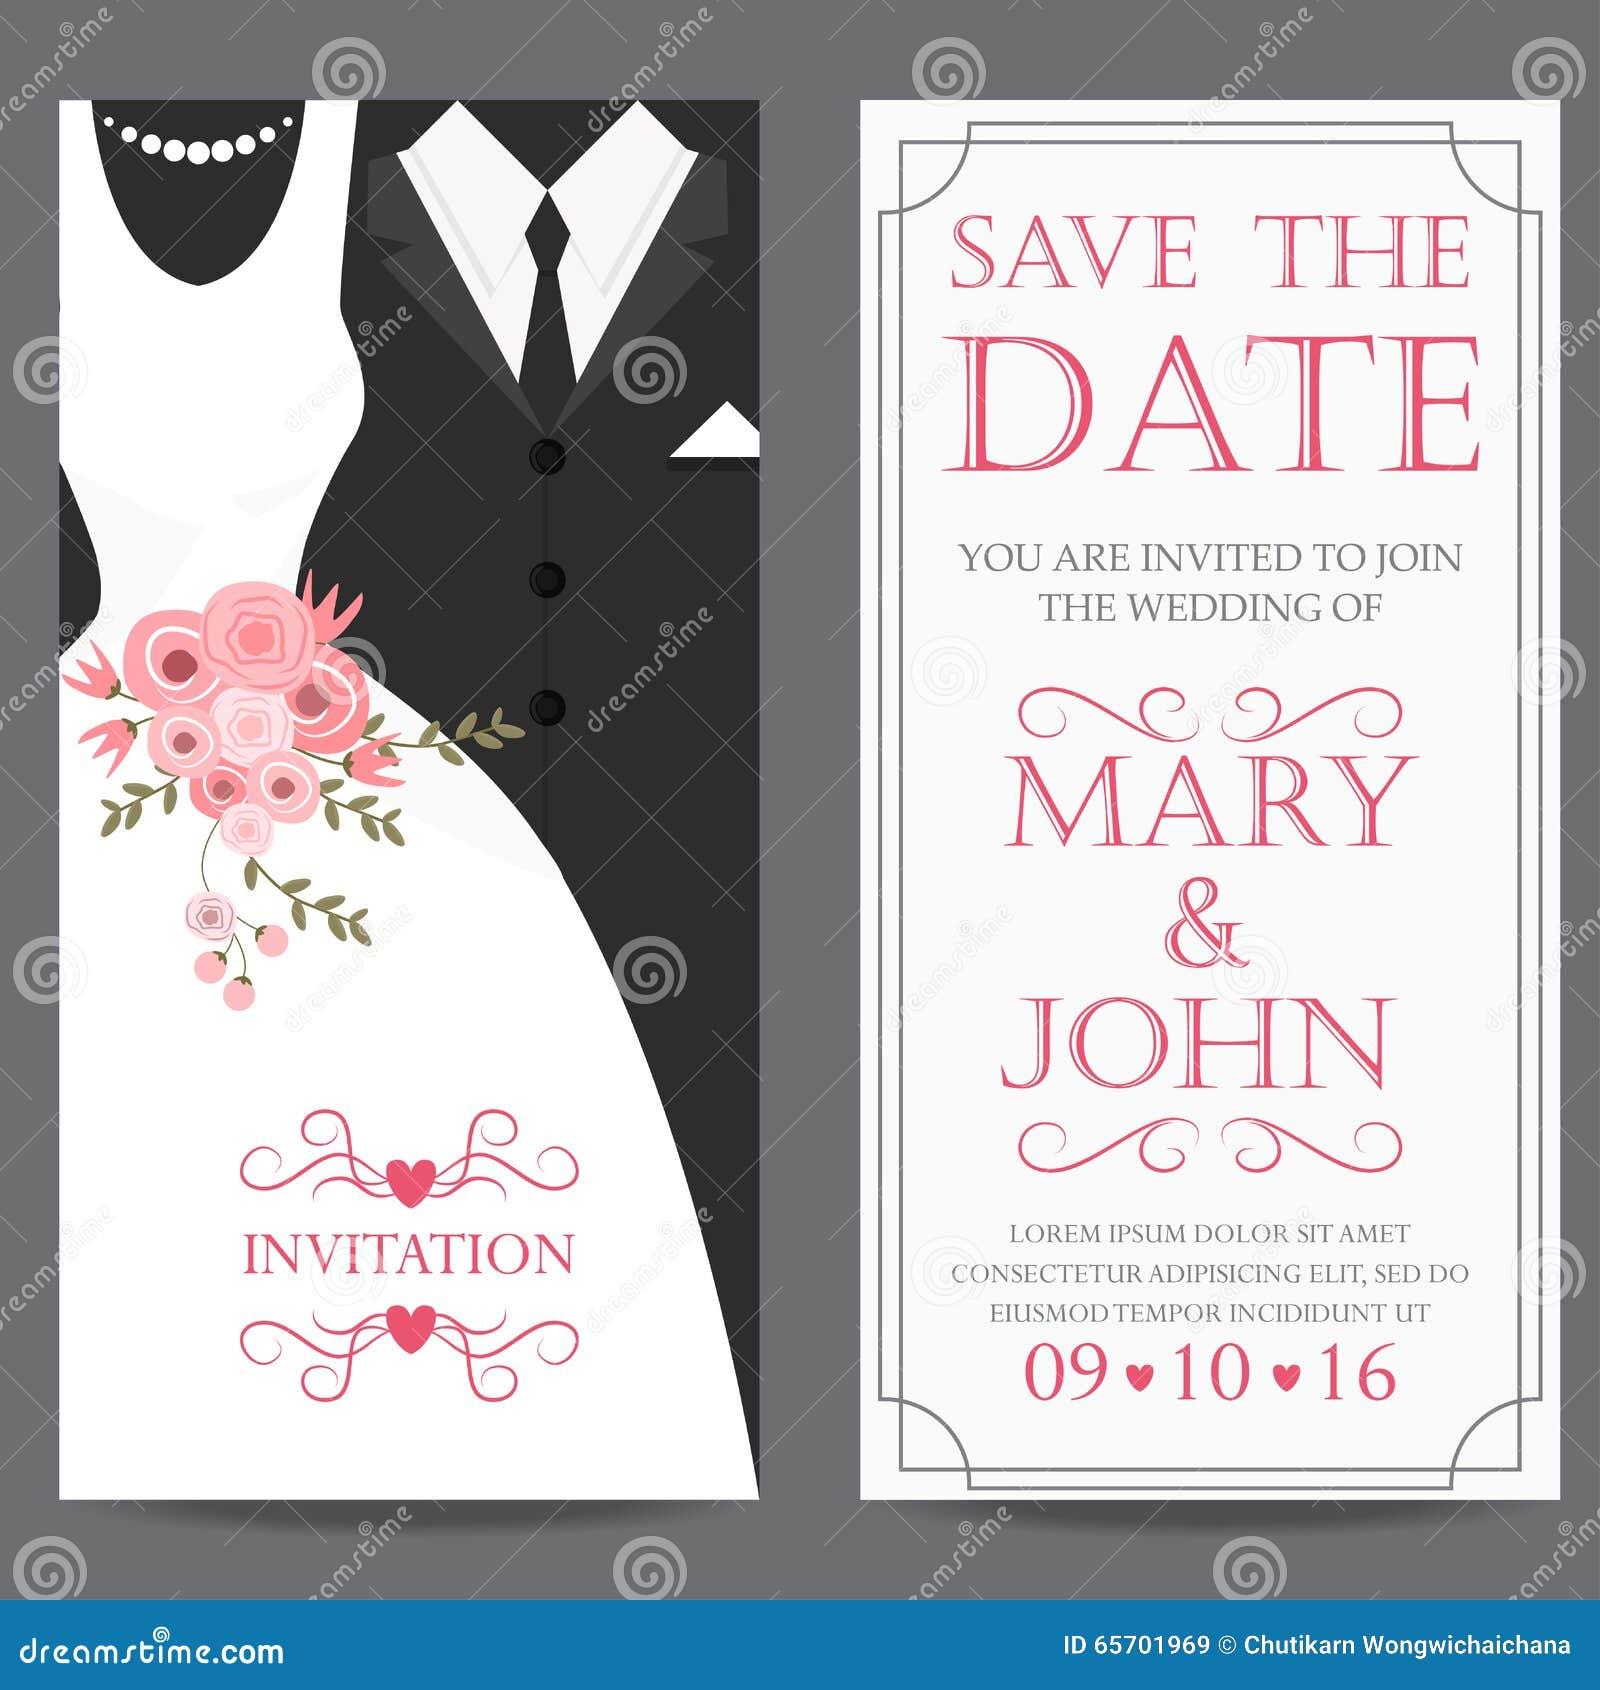 For The Bride Airfare To 117